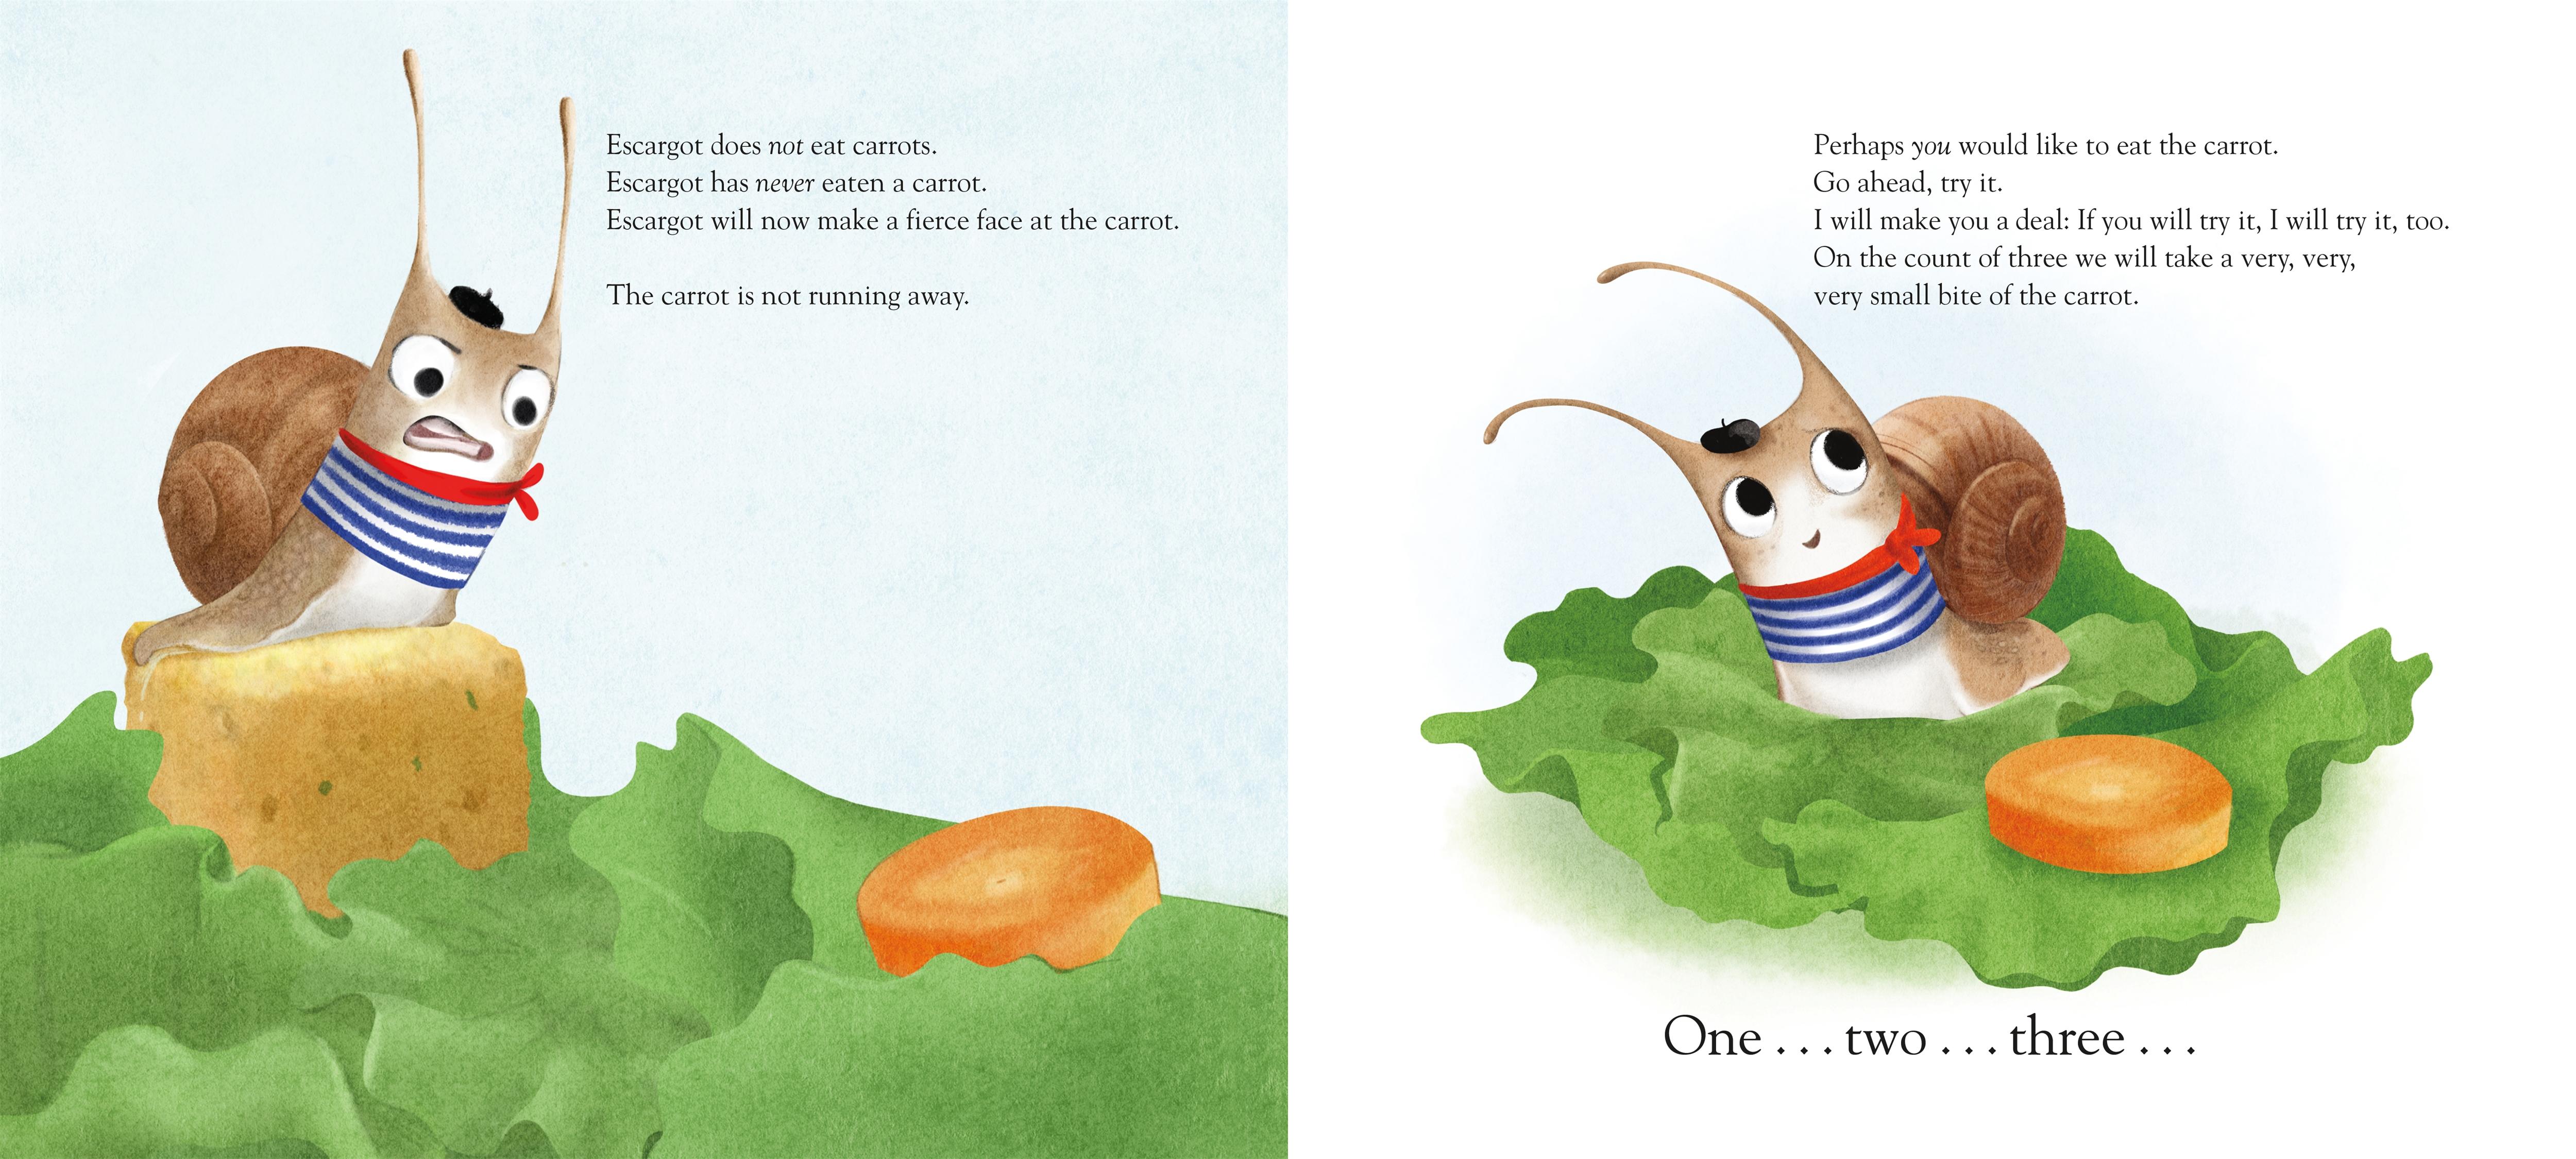 celebrate-picture-books-picture-book-review-escargot-carrot